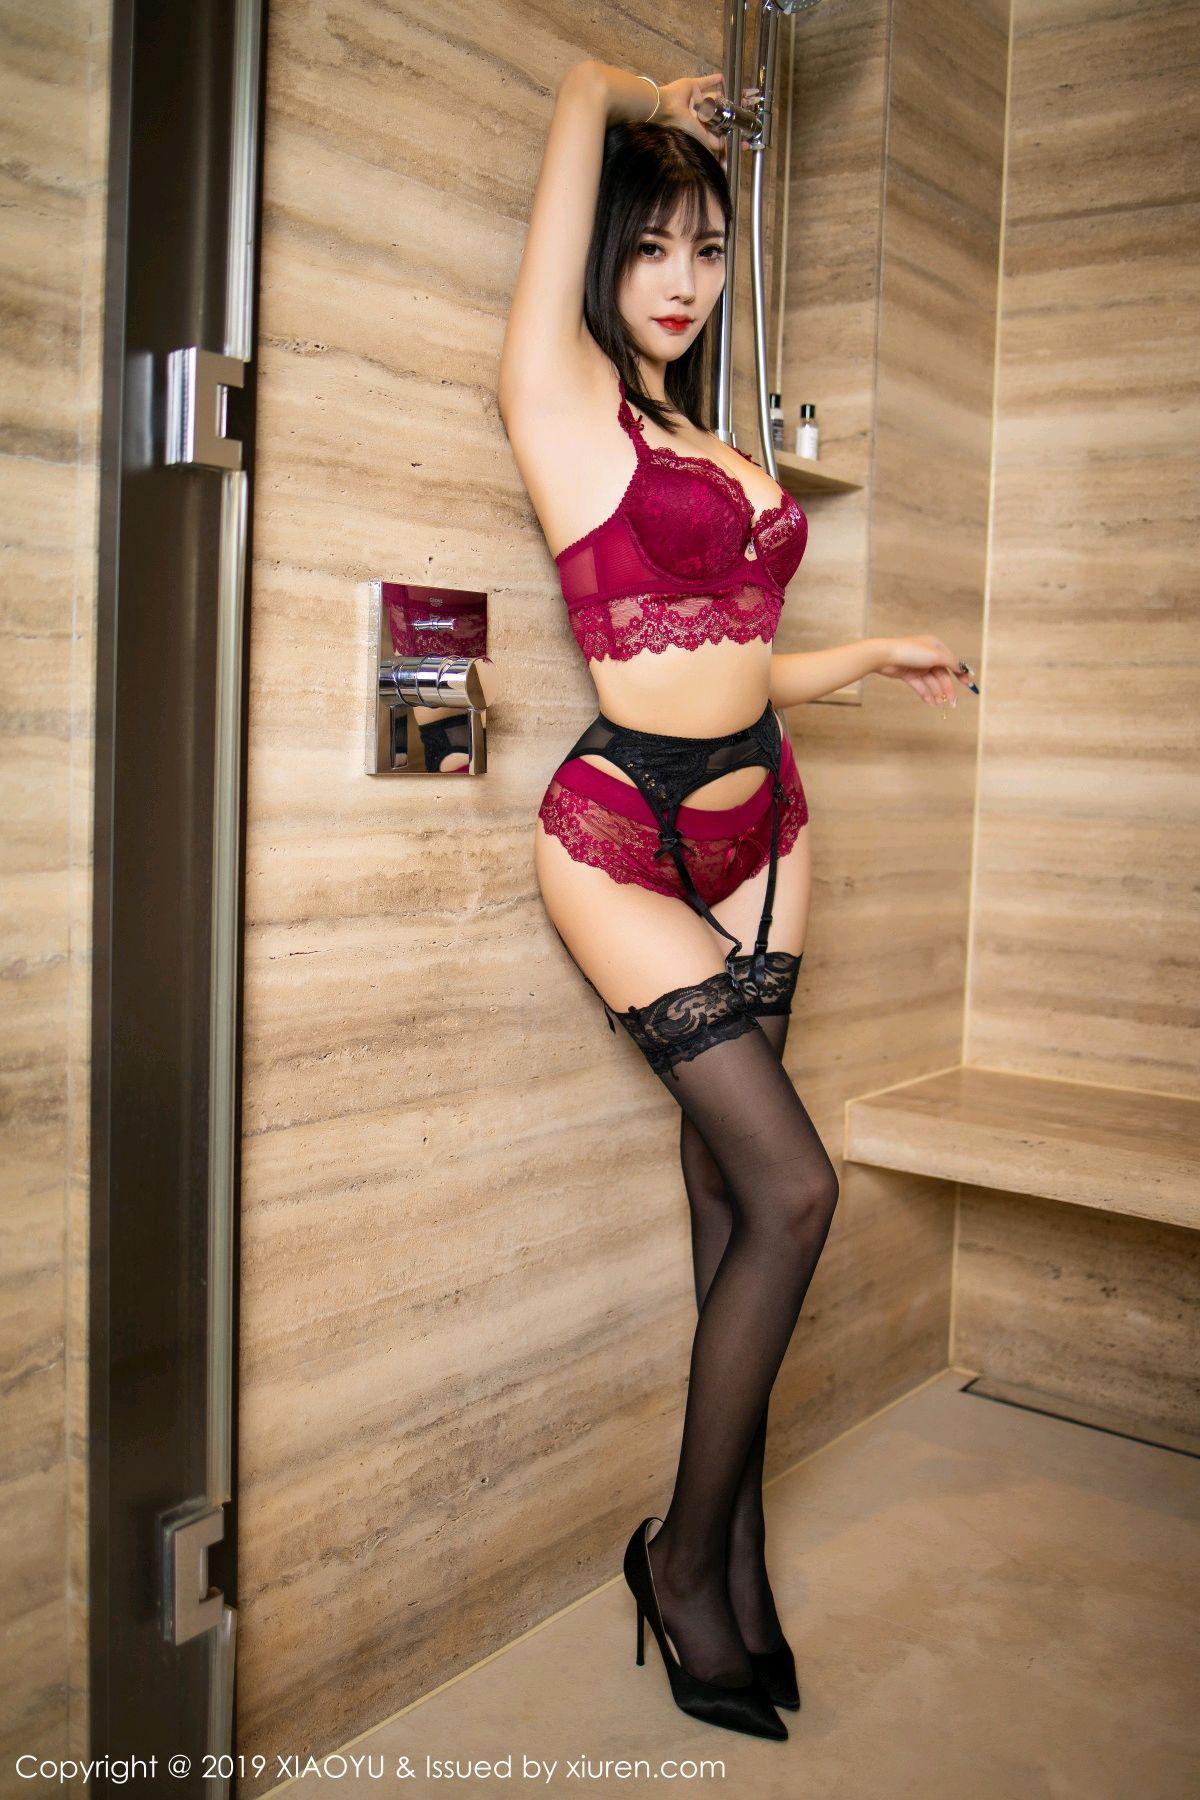 [XiaoYu] Vol.153 Yang Chen Chen 51P, Bathroom, Black Silk, Underwear, XiaoYu, Yang Chen Chen